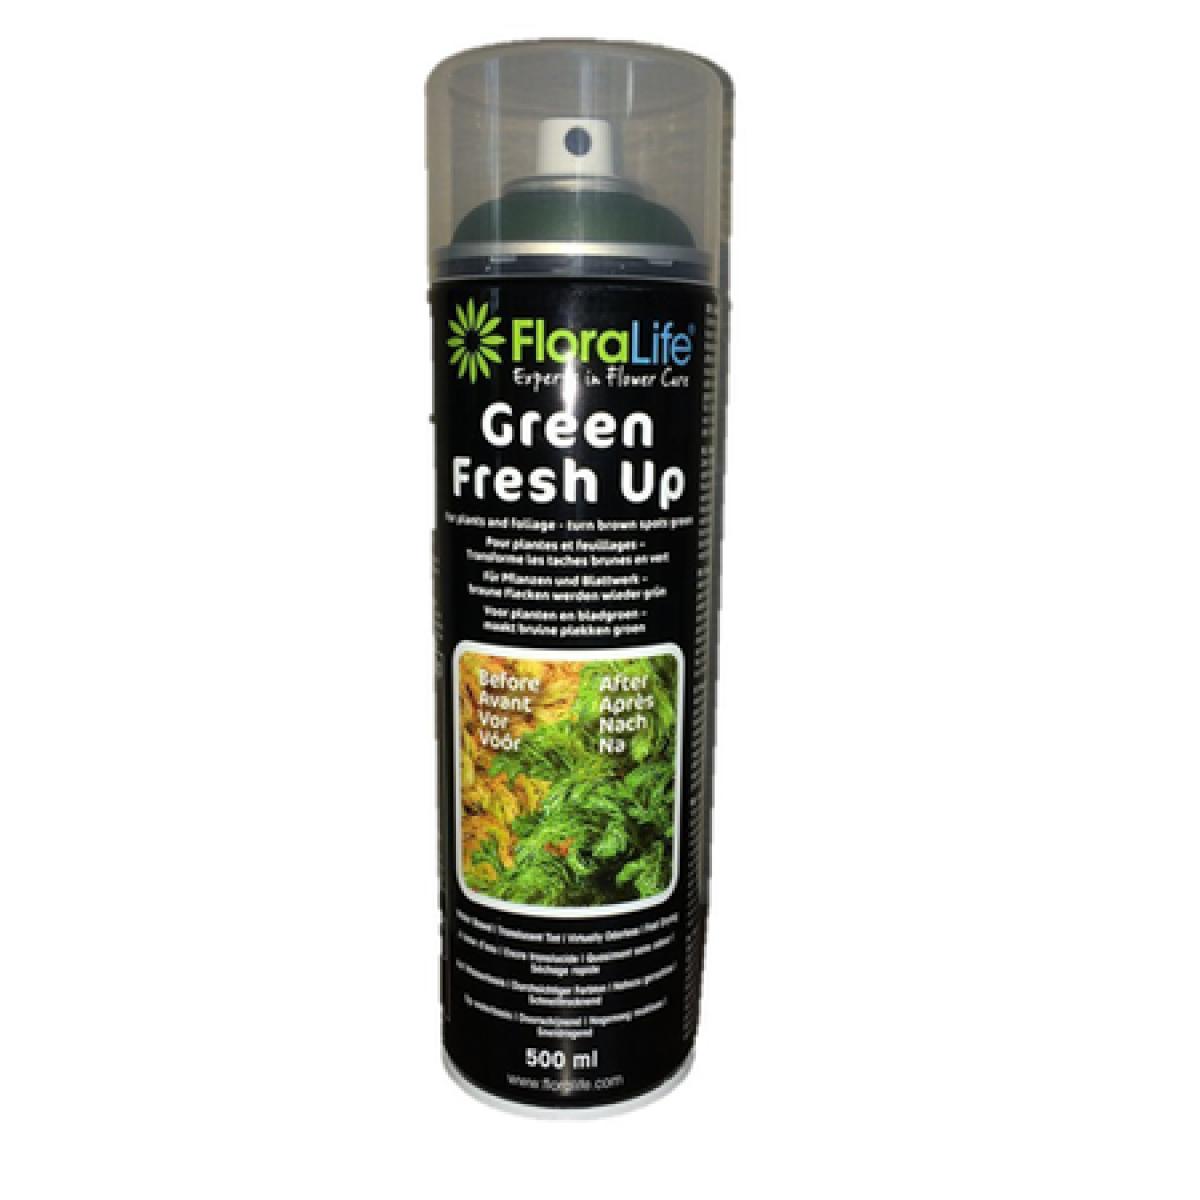 1502 Floralife Green Fresh Up Light Green 500ml - 1 No